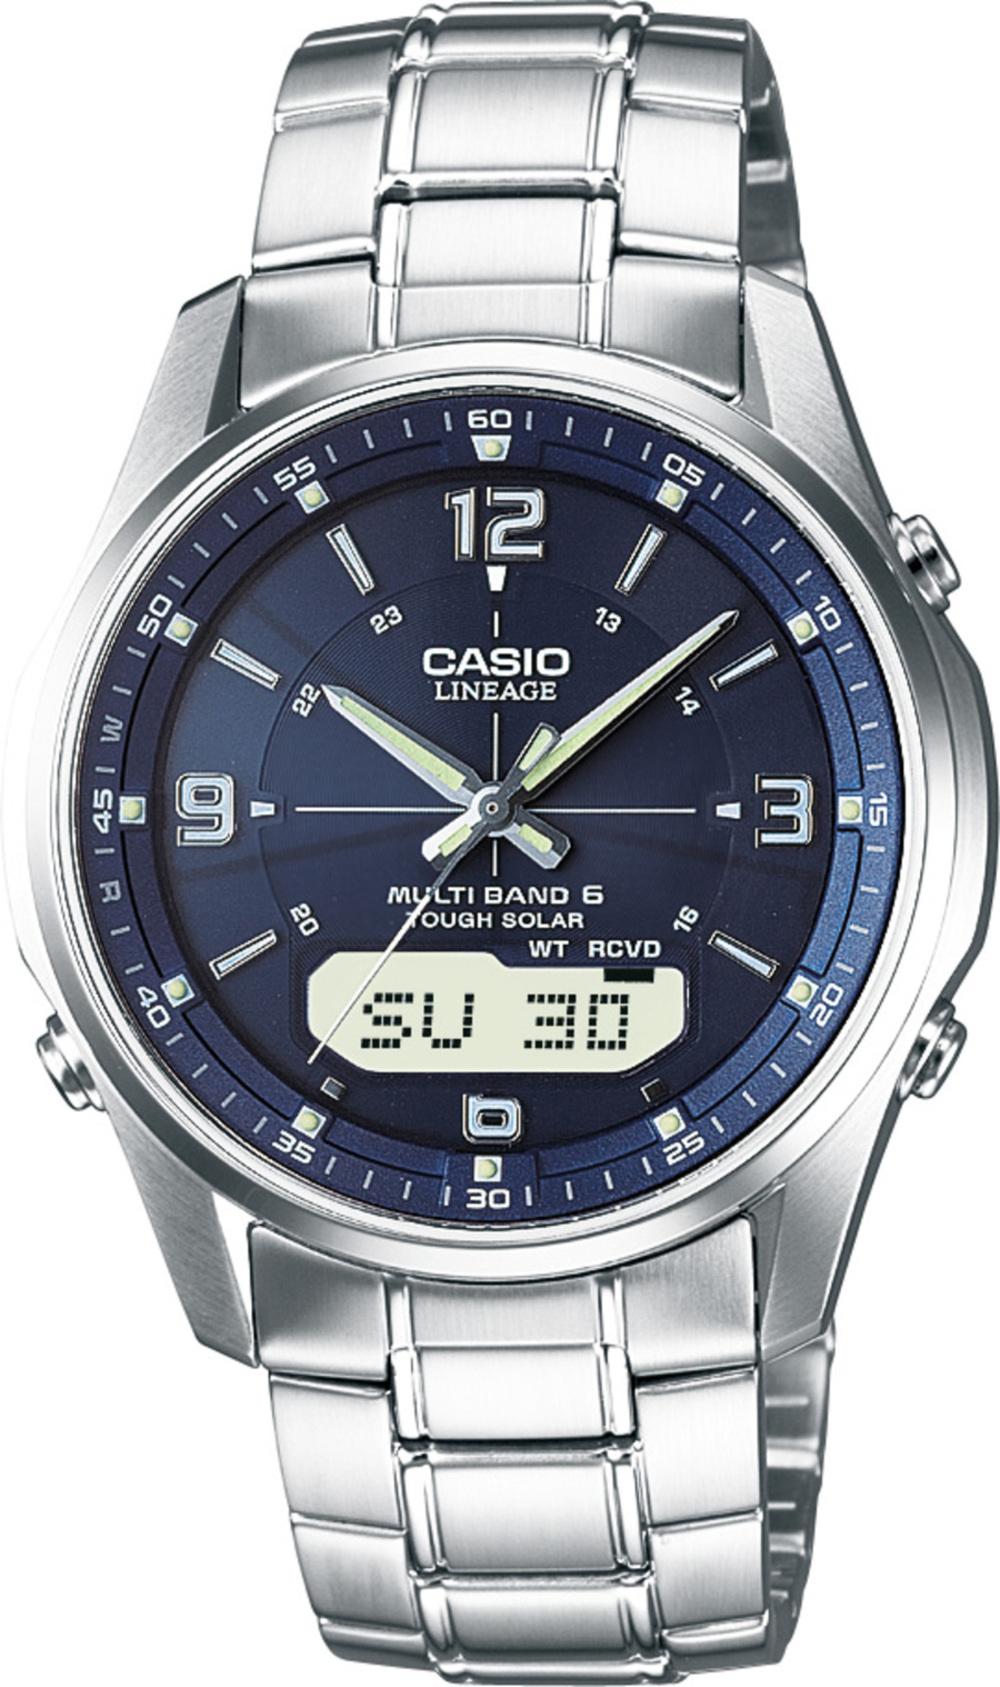 CASIO Unisexuhr LCW-M100DSE-2AER Funk Solaruhr Edelstahl Saphirglas Analog Digital blaues Zifferblatt 367257000